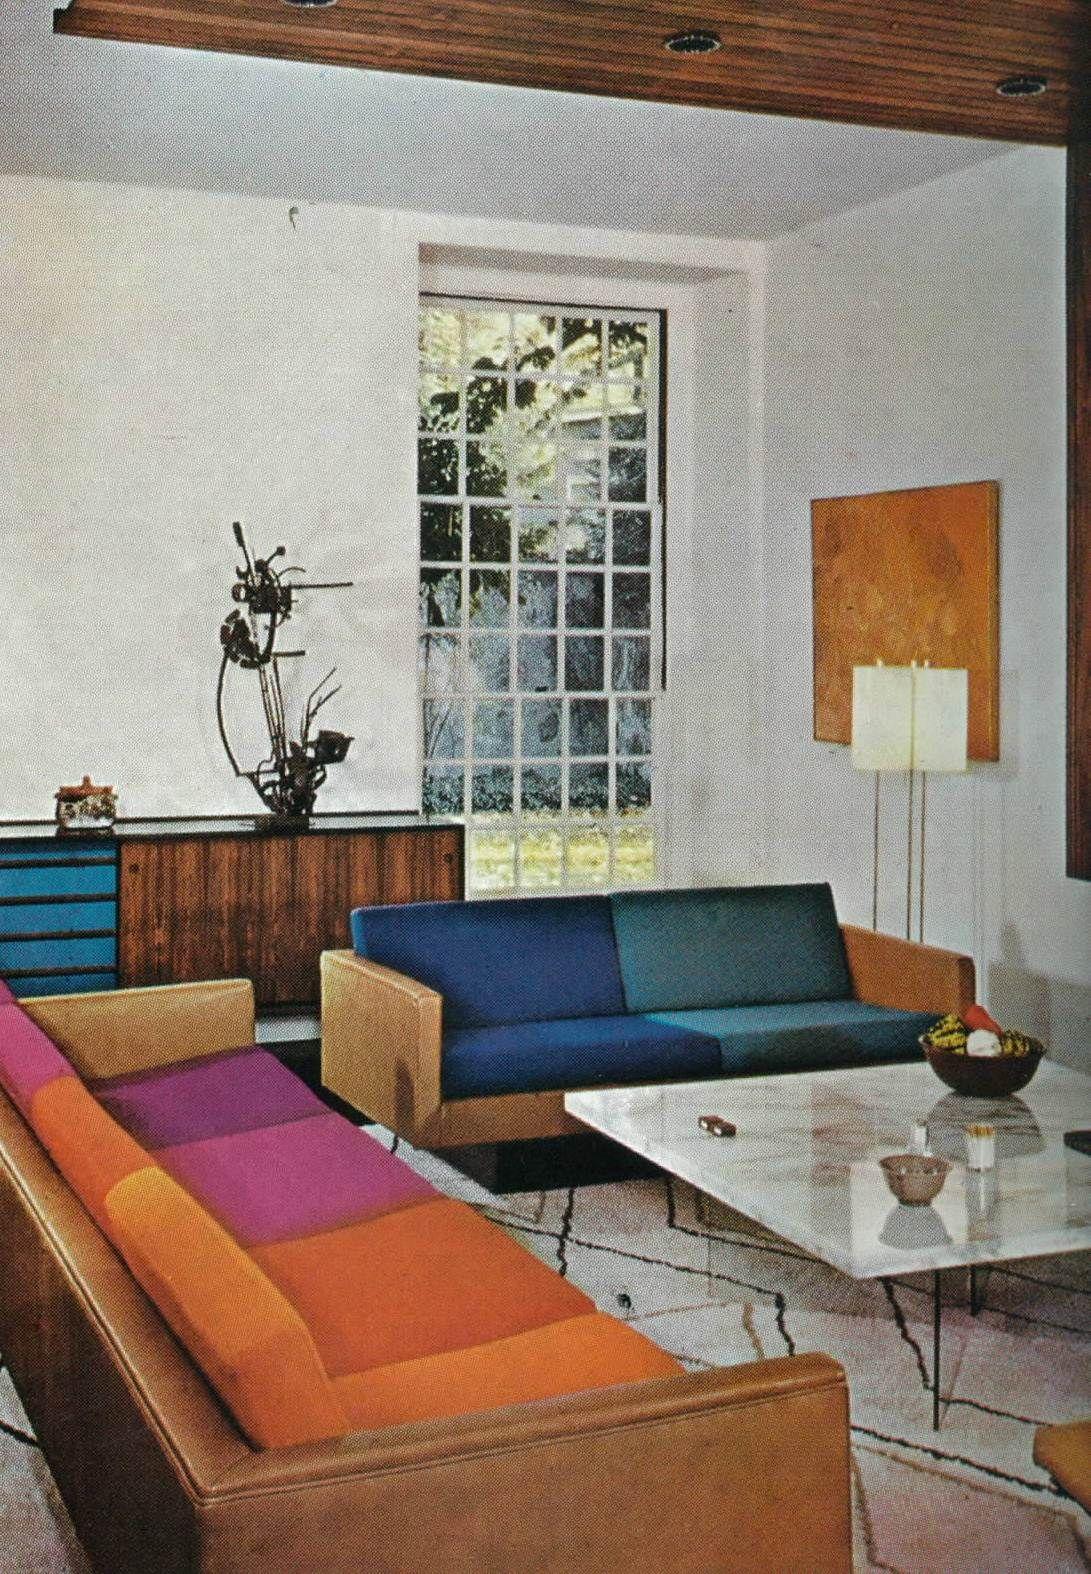 ja topanga sofa with custom cushions maison dcor rtro dcor des annes 1970